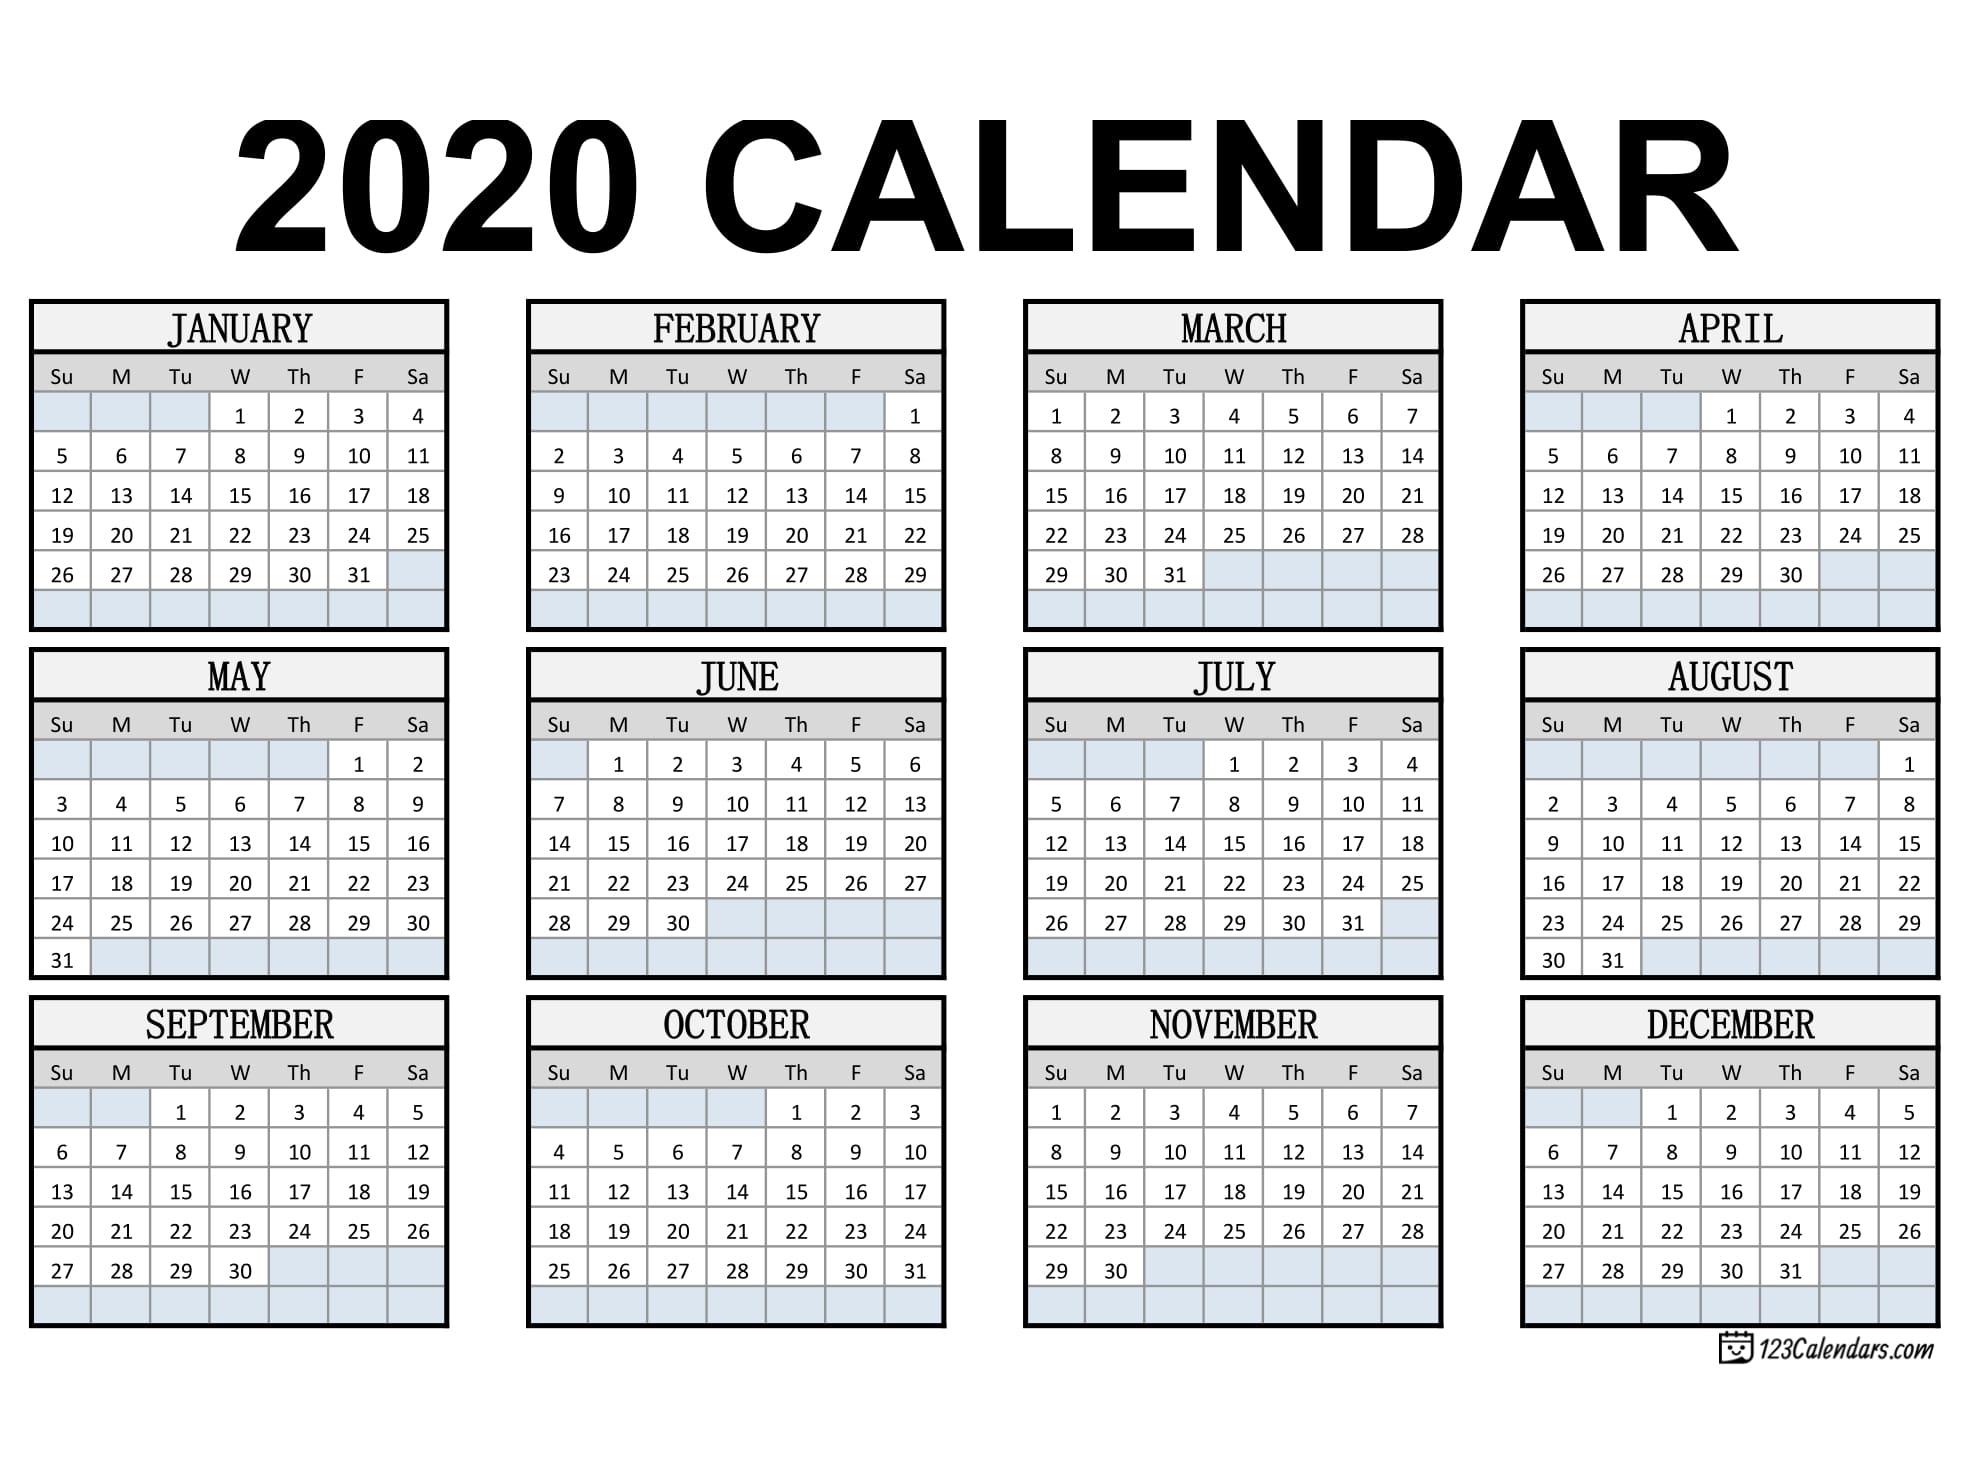 Free Printable Year 2020 Calendar   123Calendars